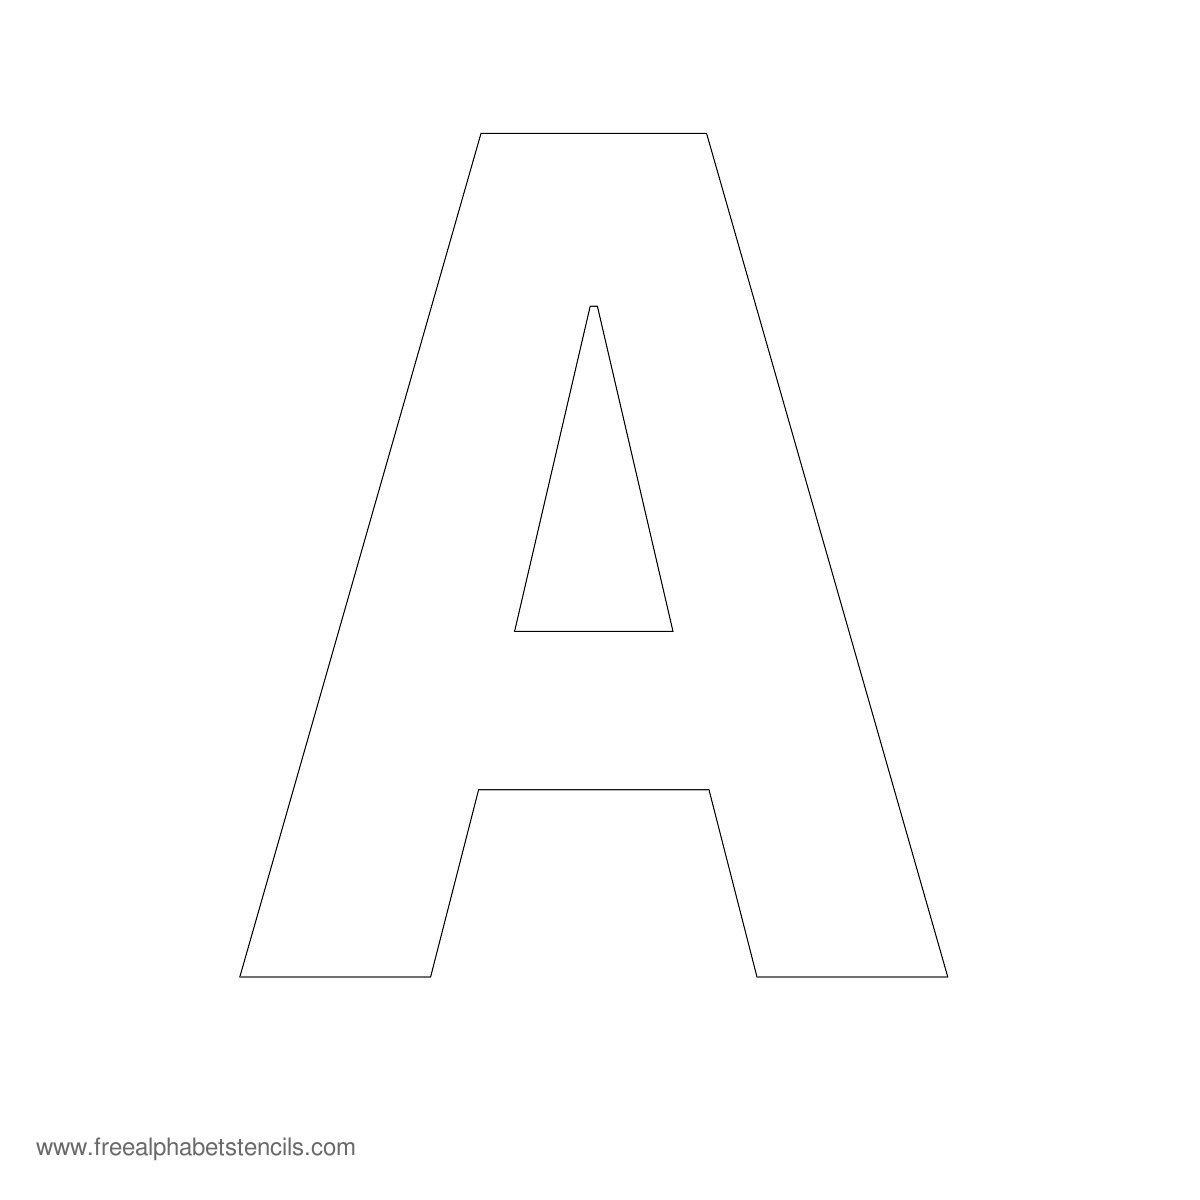 Large Alphabet Stencils   Freealphabetstencils - Free Printable Alphabet Stencils Templates